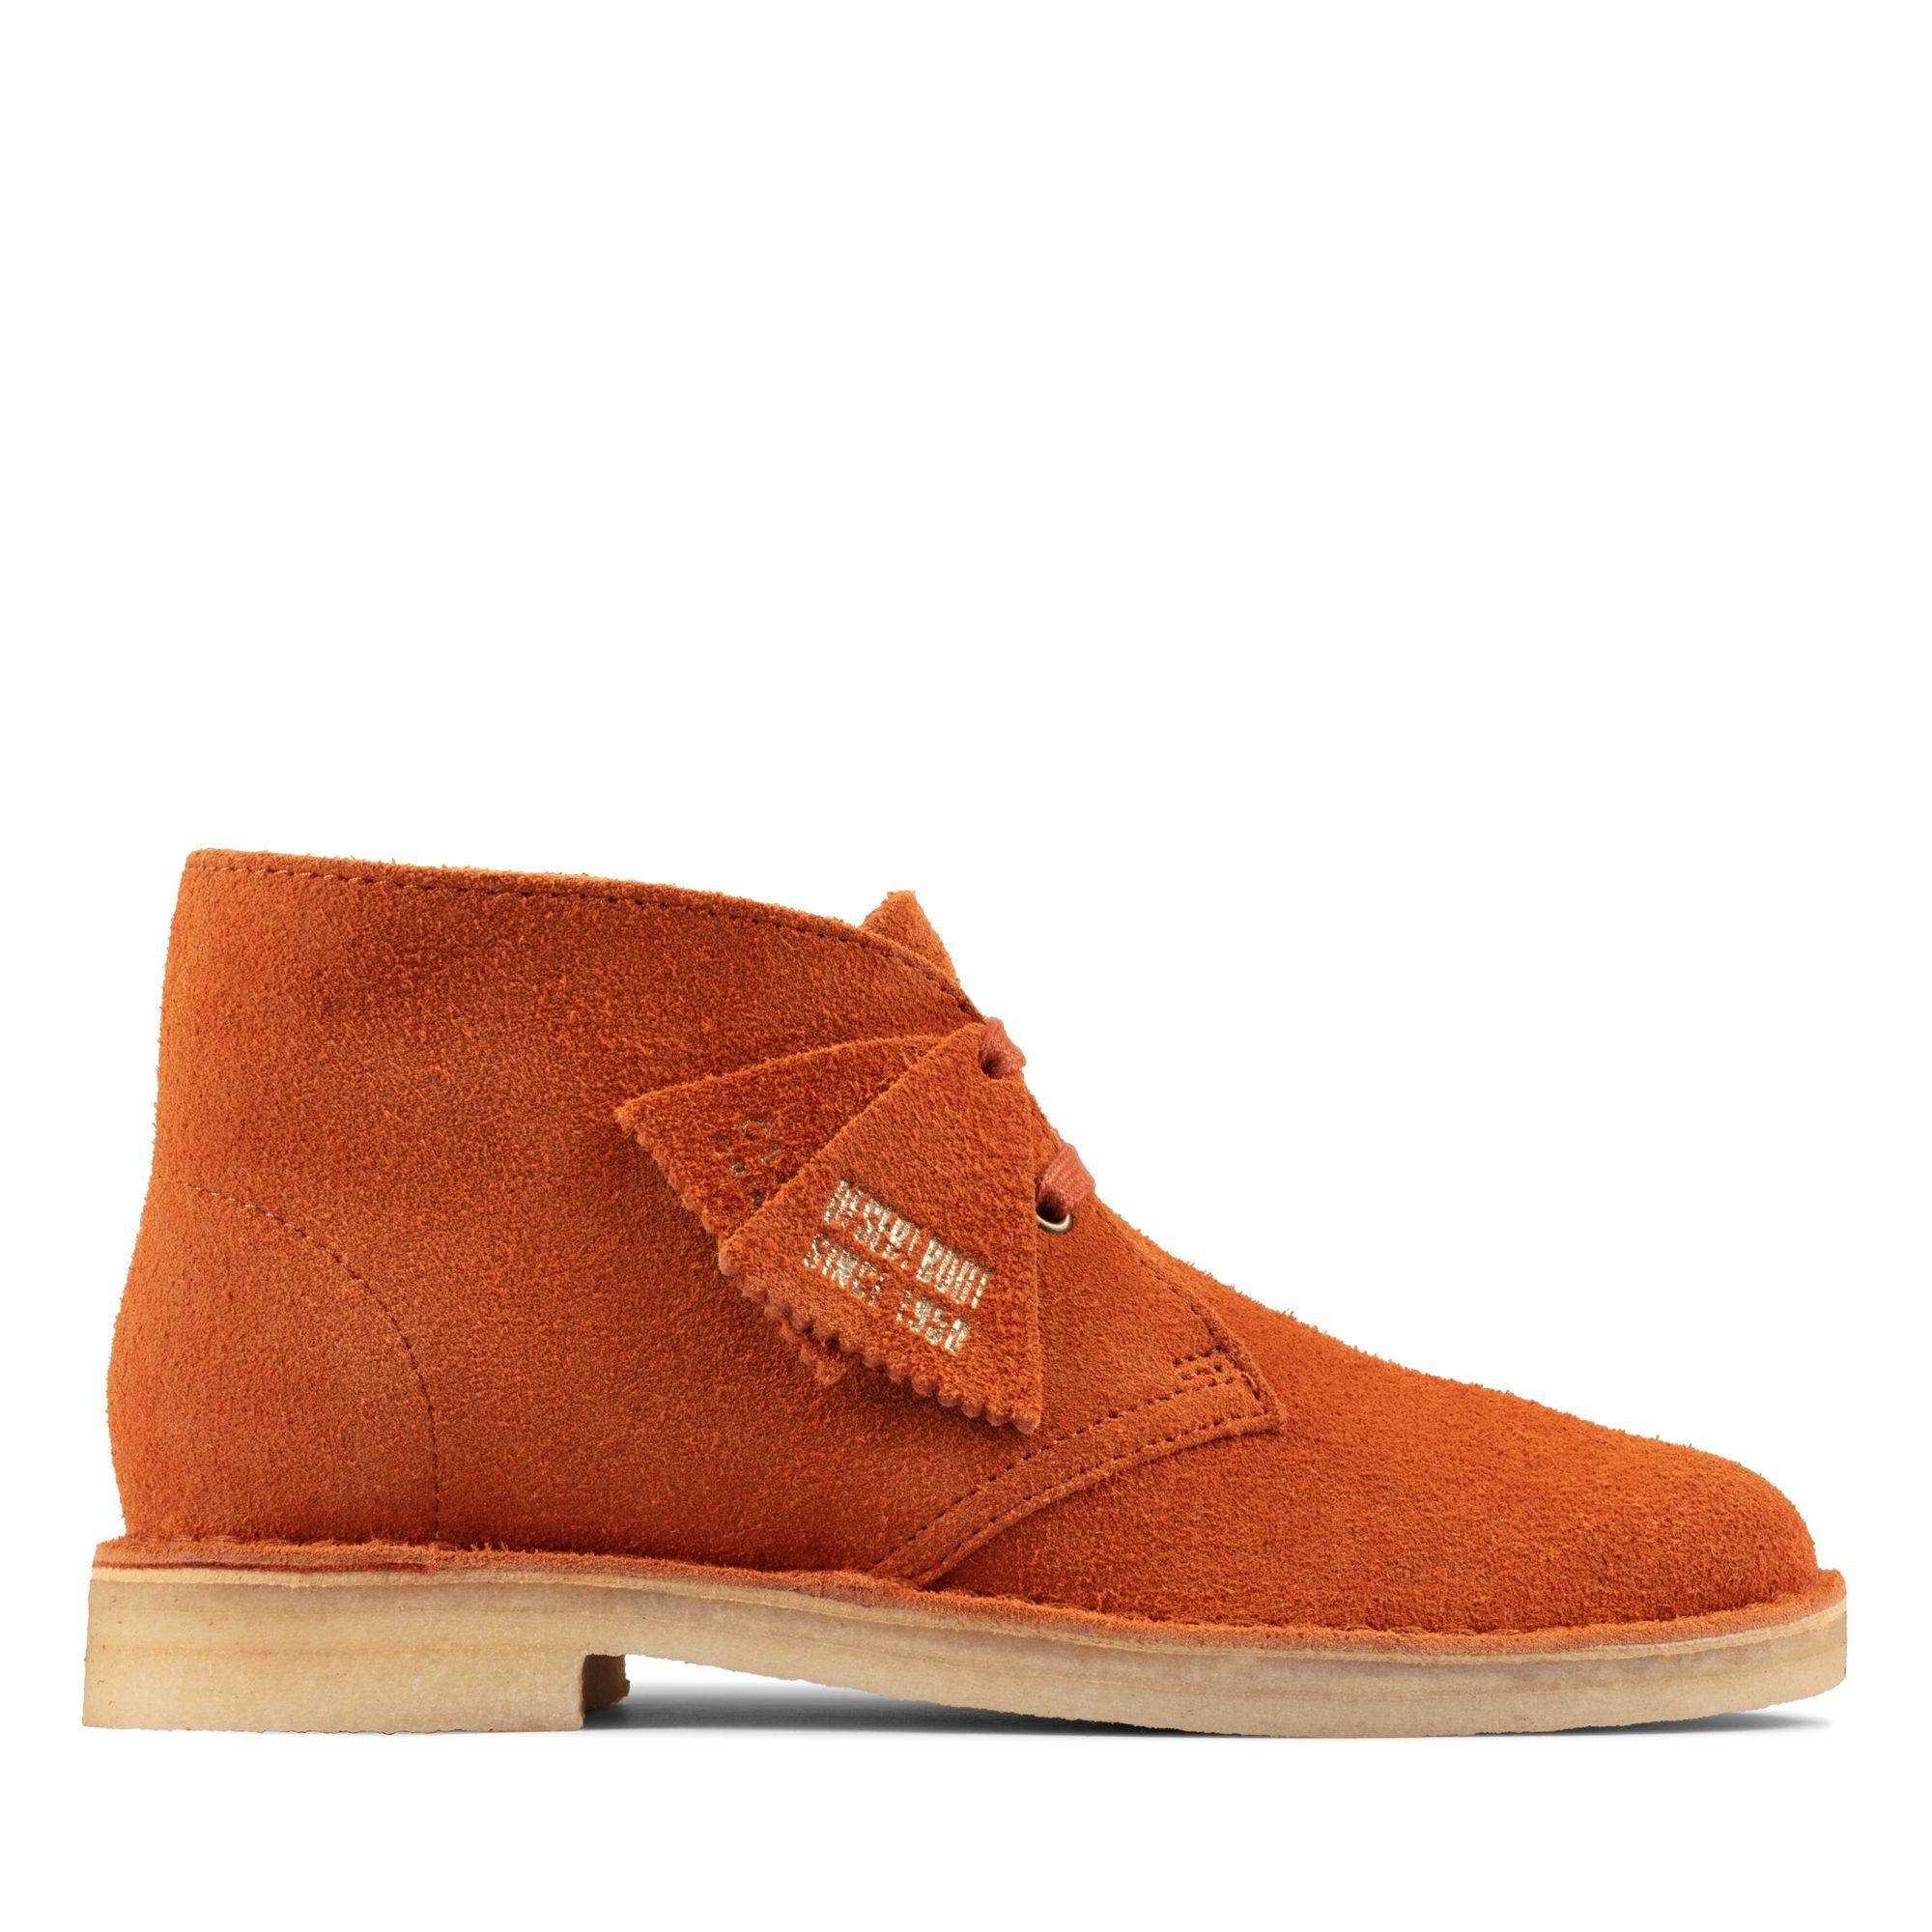 Men's Ginger Suede Desert Boots